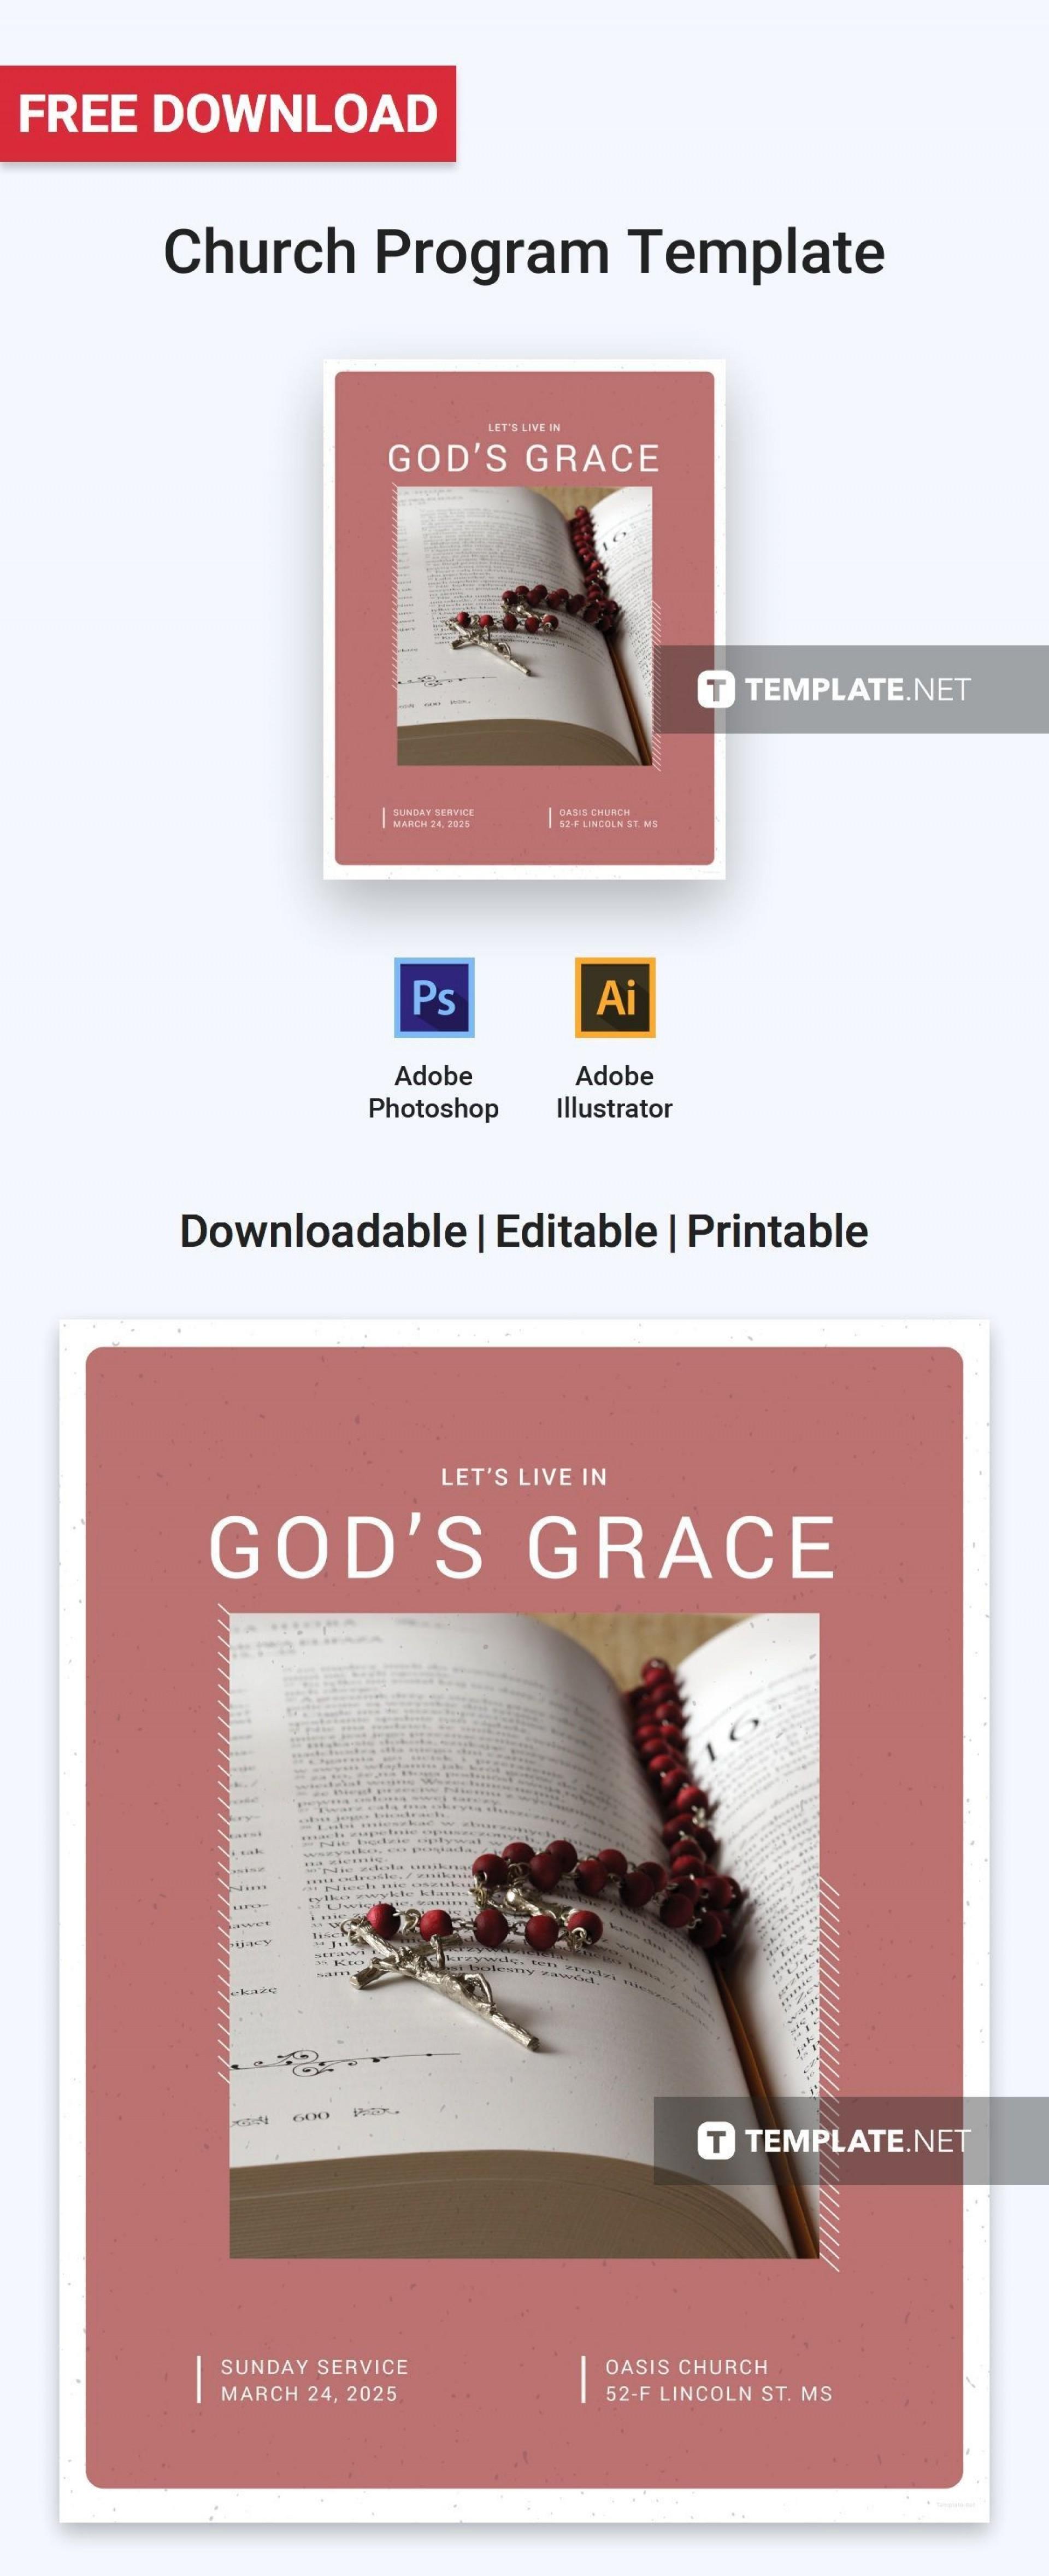 002 Unbelievable Free Church Program Template High Definition  Printable Anniversary Doc1920